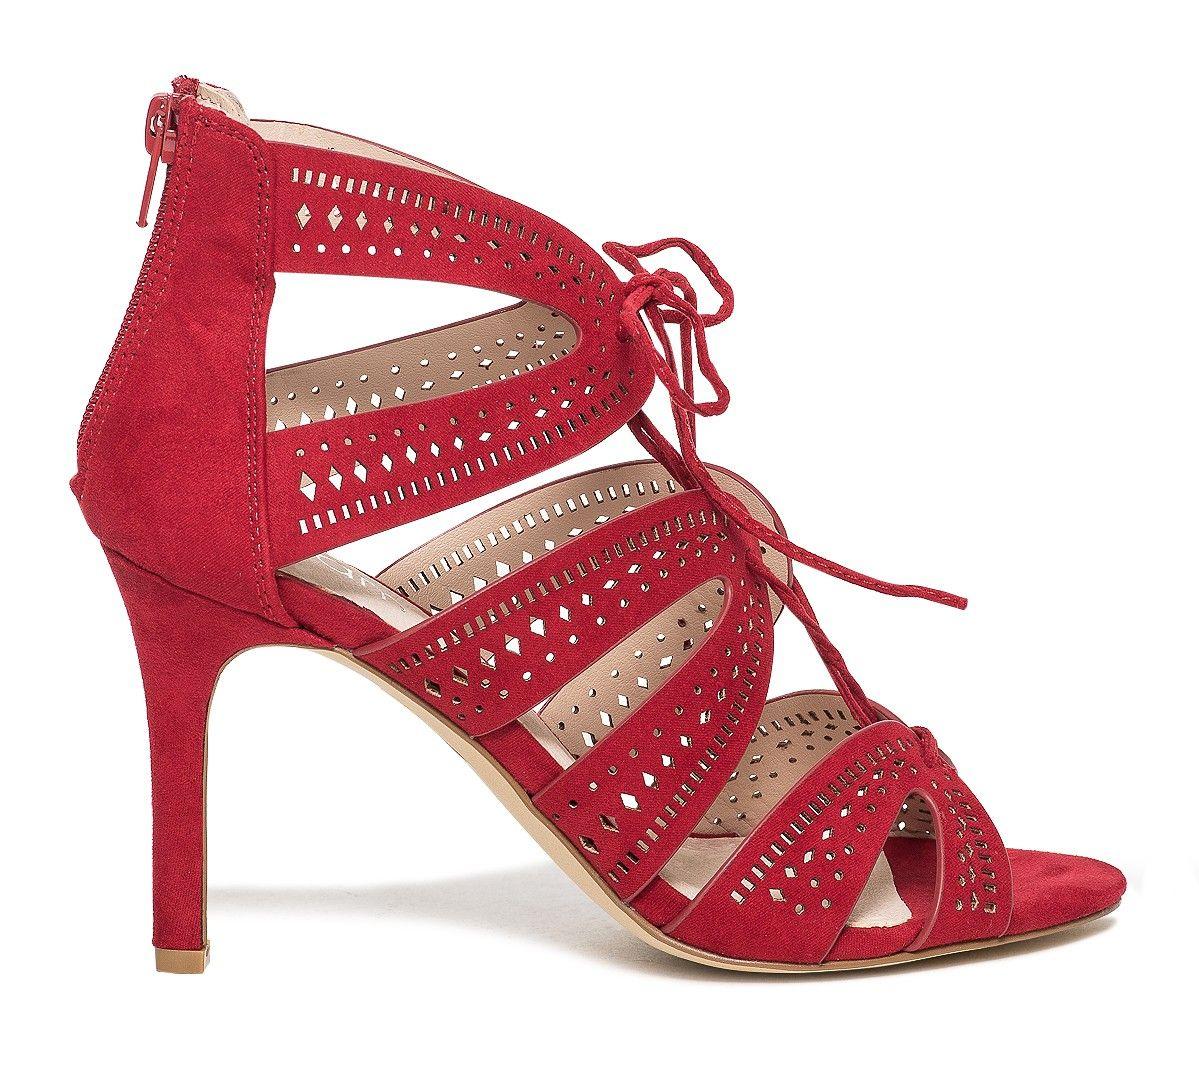 LEIT Talons Hauts Femmes Dentelle Rouge Chaussures Femme Pearl,39,Red